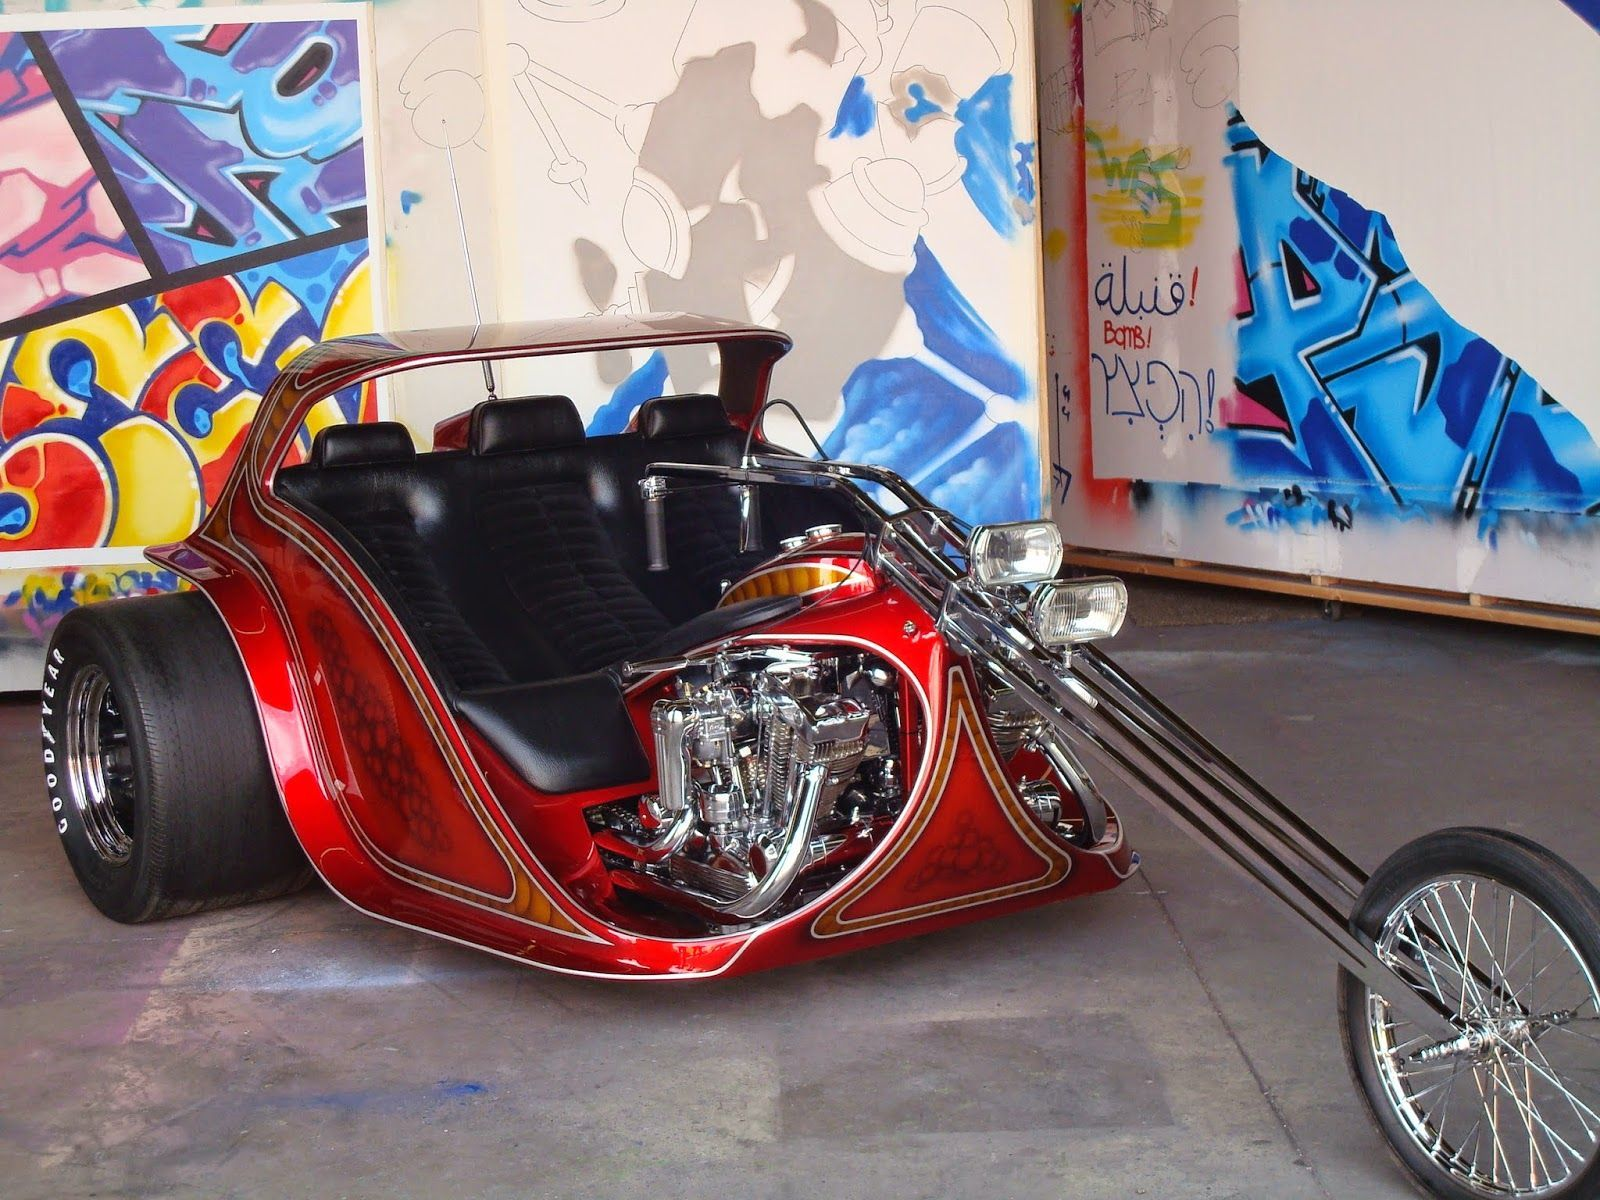 chopper vehicles motorbikes - photo #38